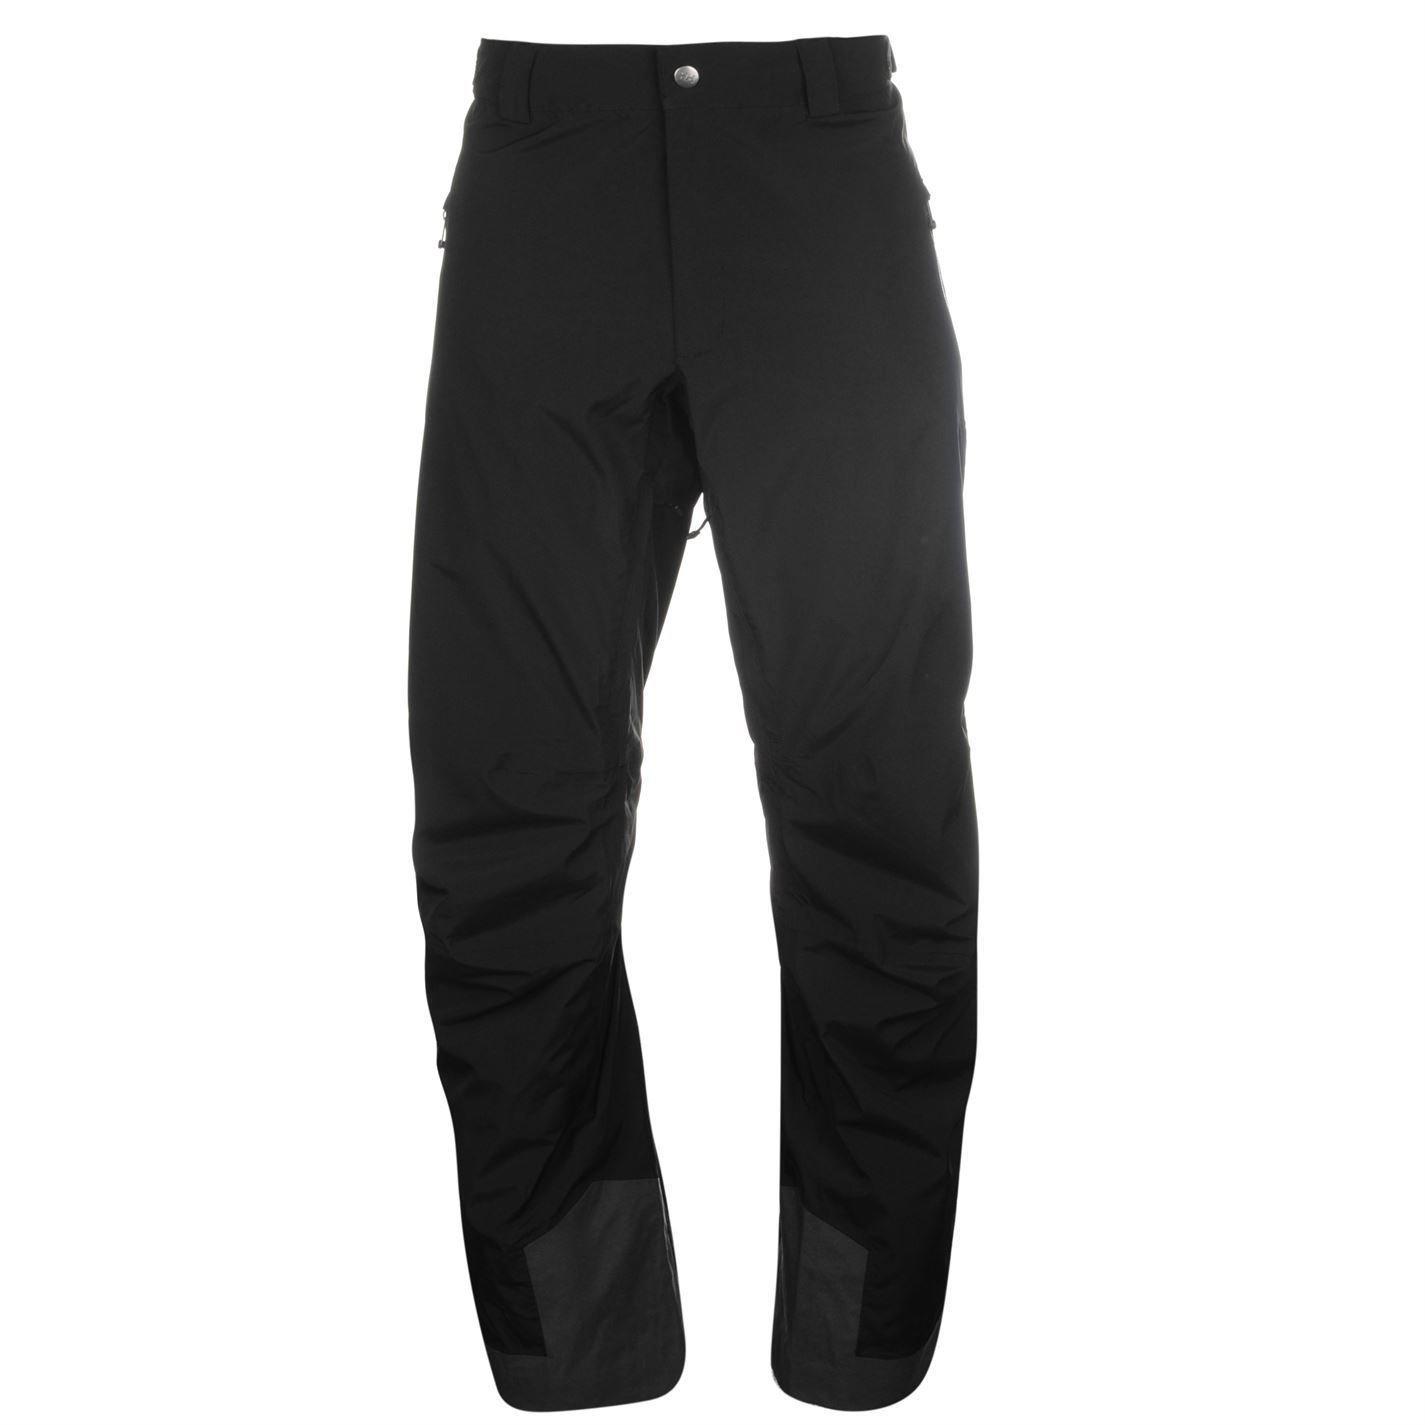 Helly Hansen Mens Legendary Pants Ski Sports Winter Trousers Bottoms Skiwear